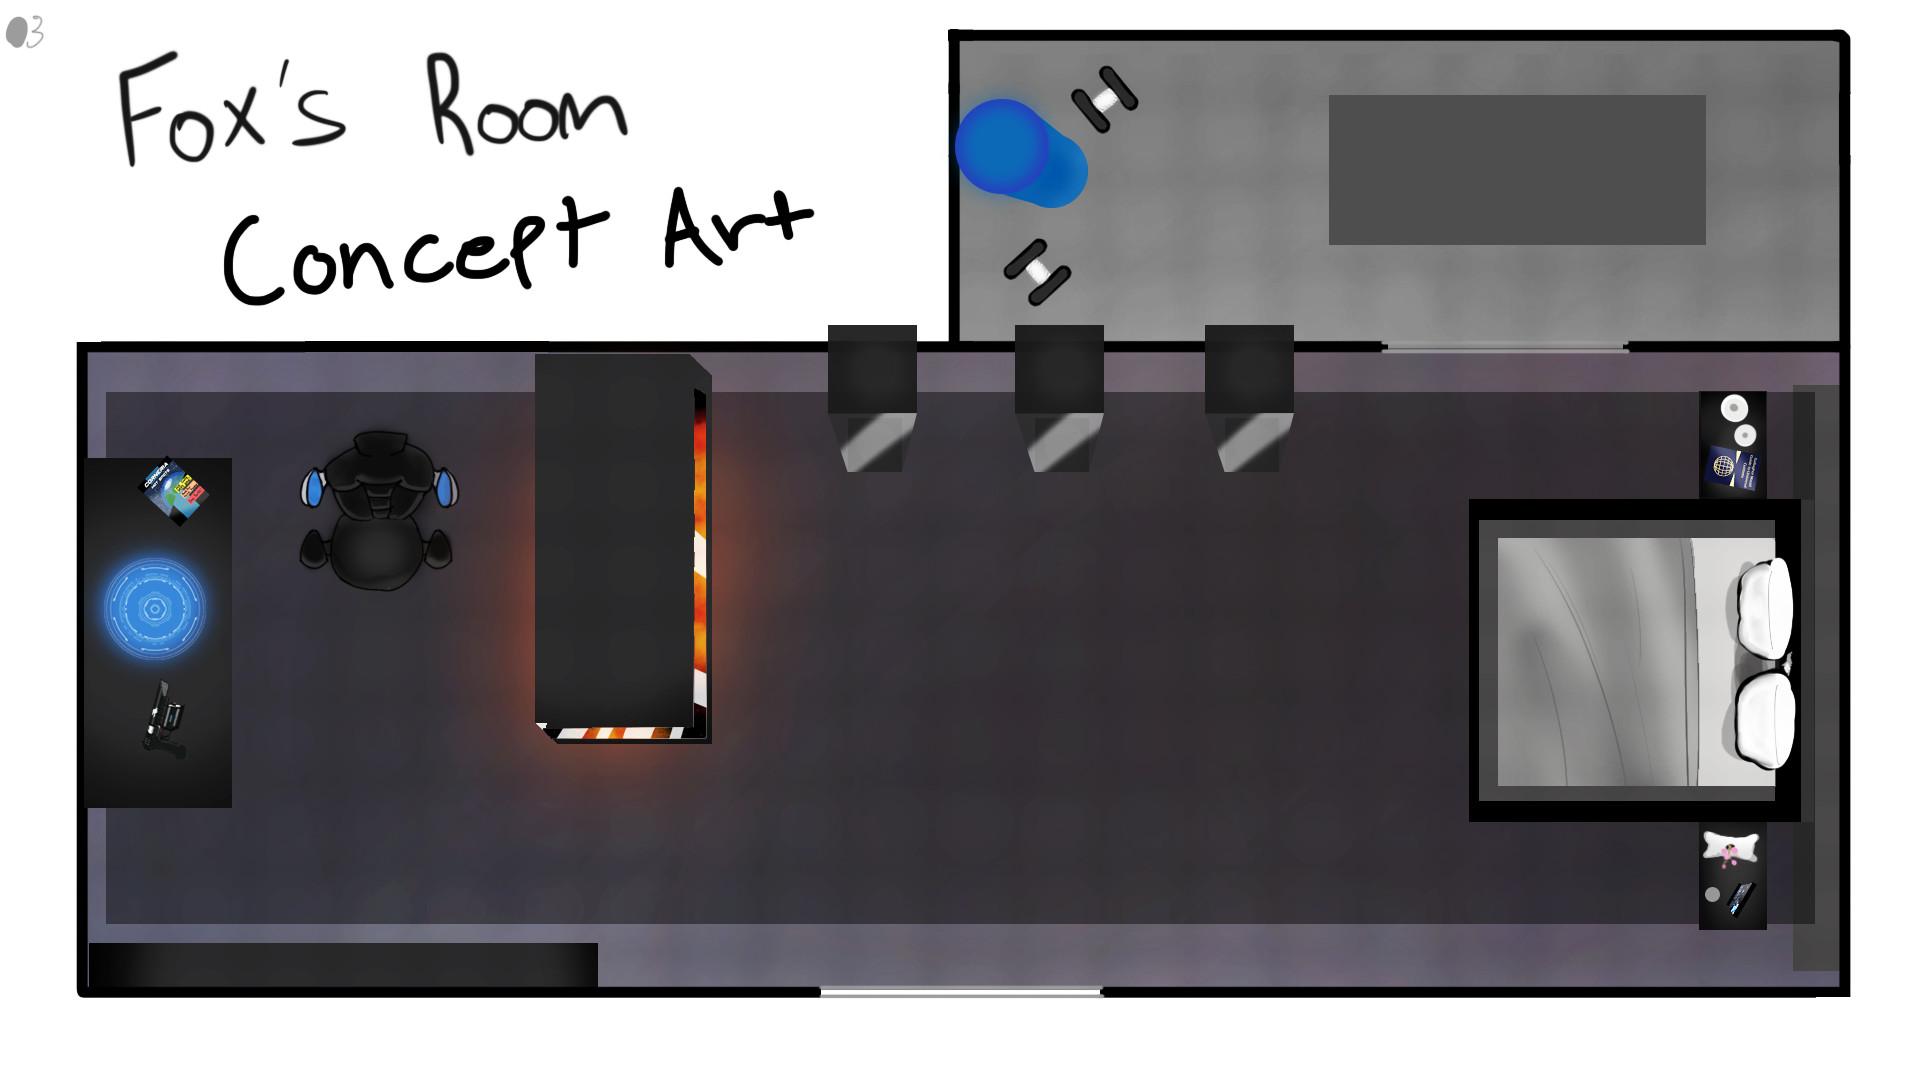 Joss Abaco Fox Mccloud S Room